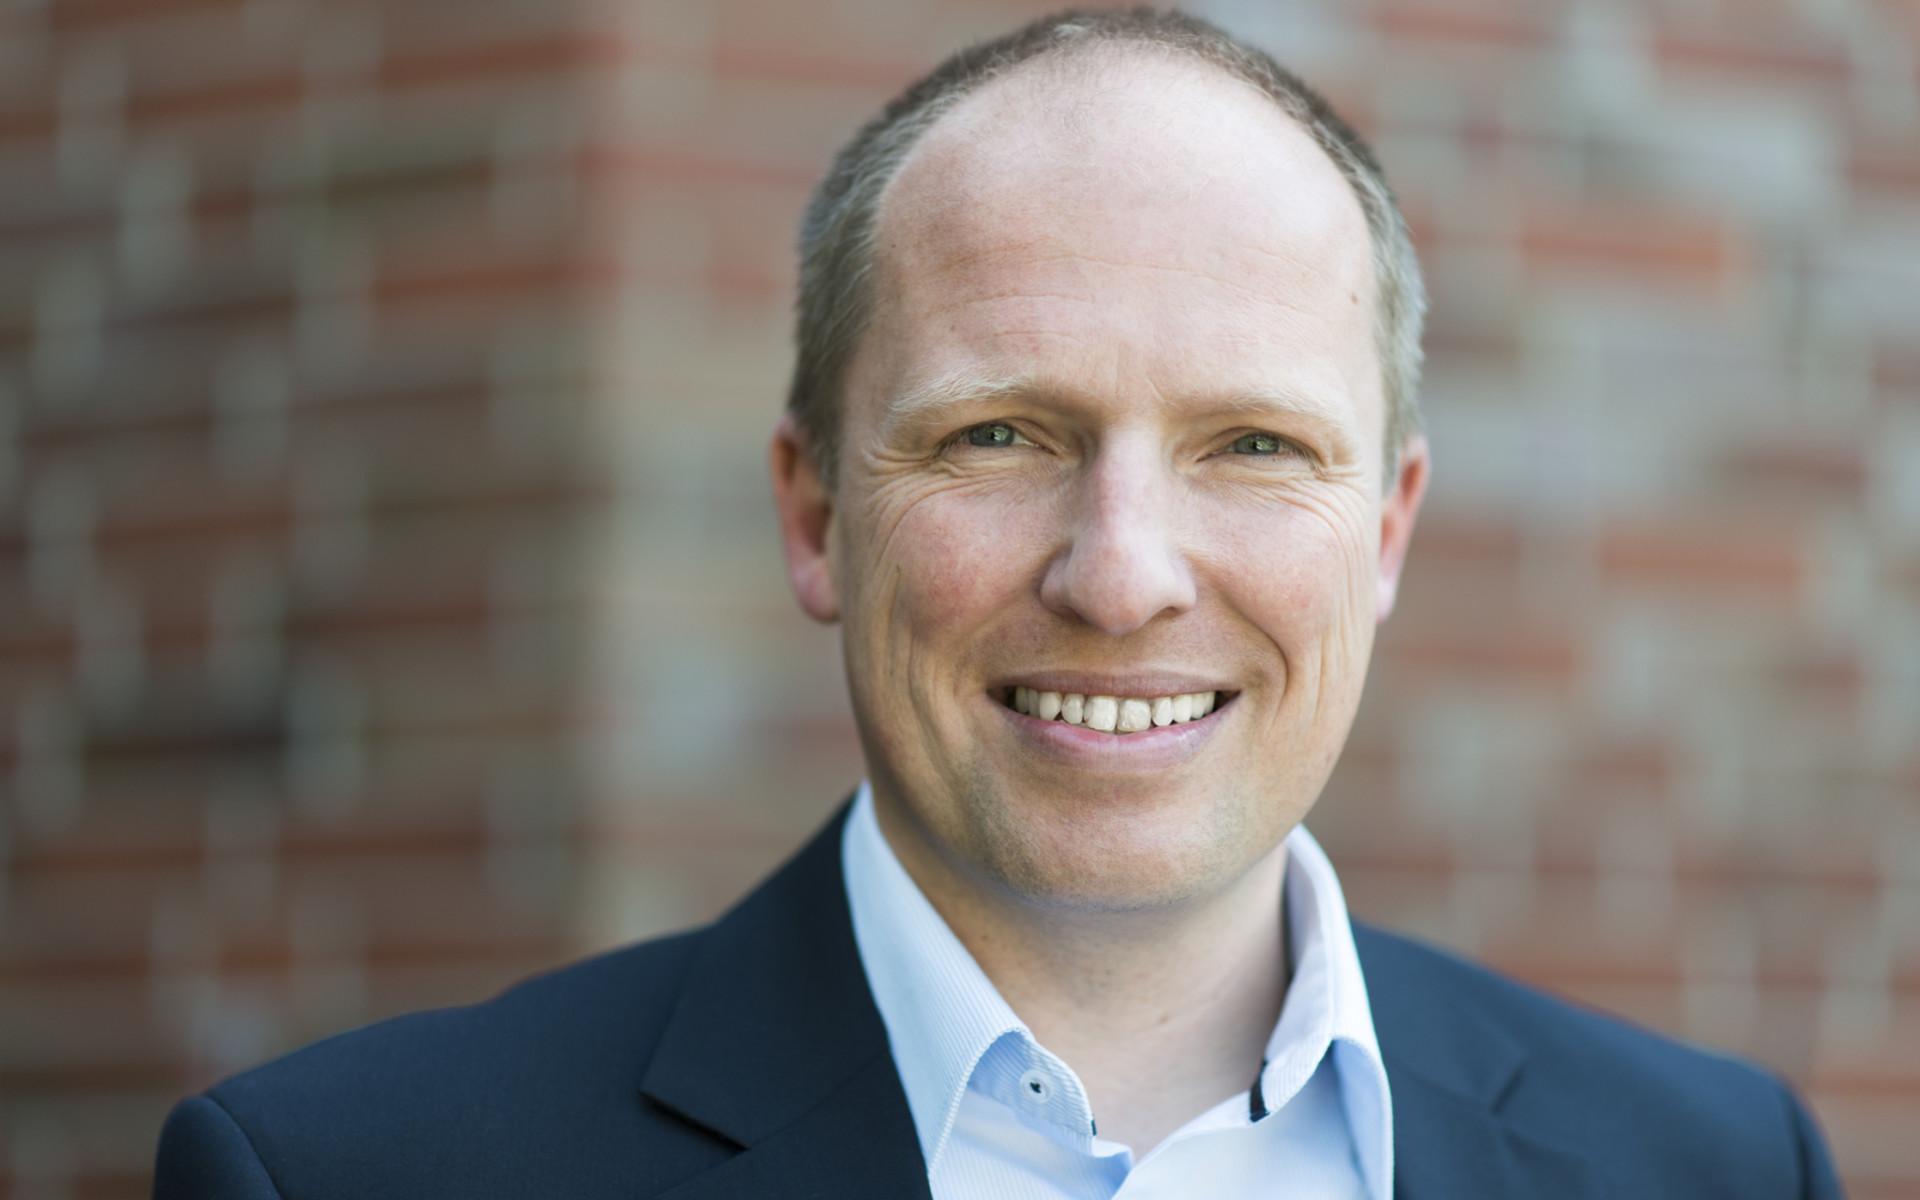 Tobias Handtke